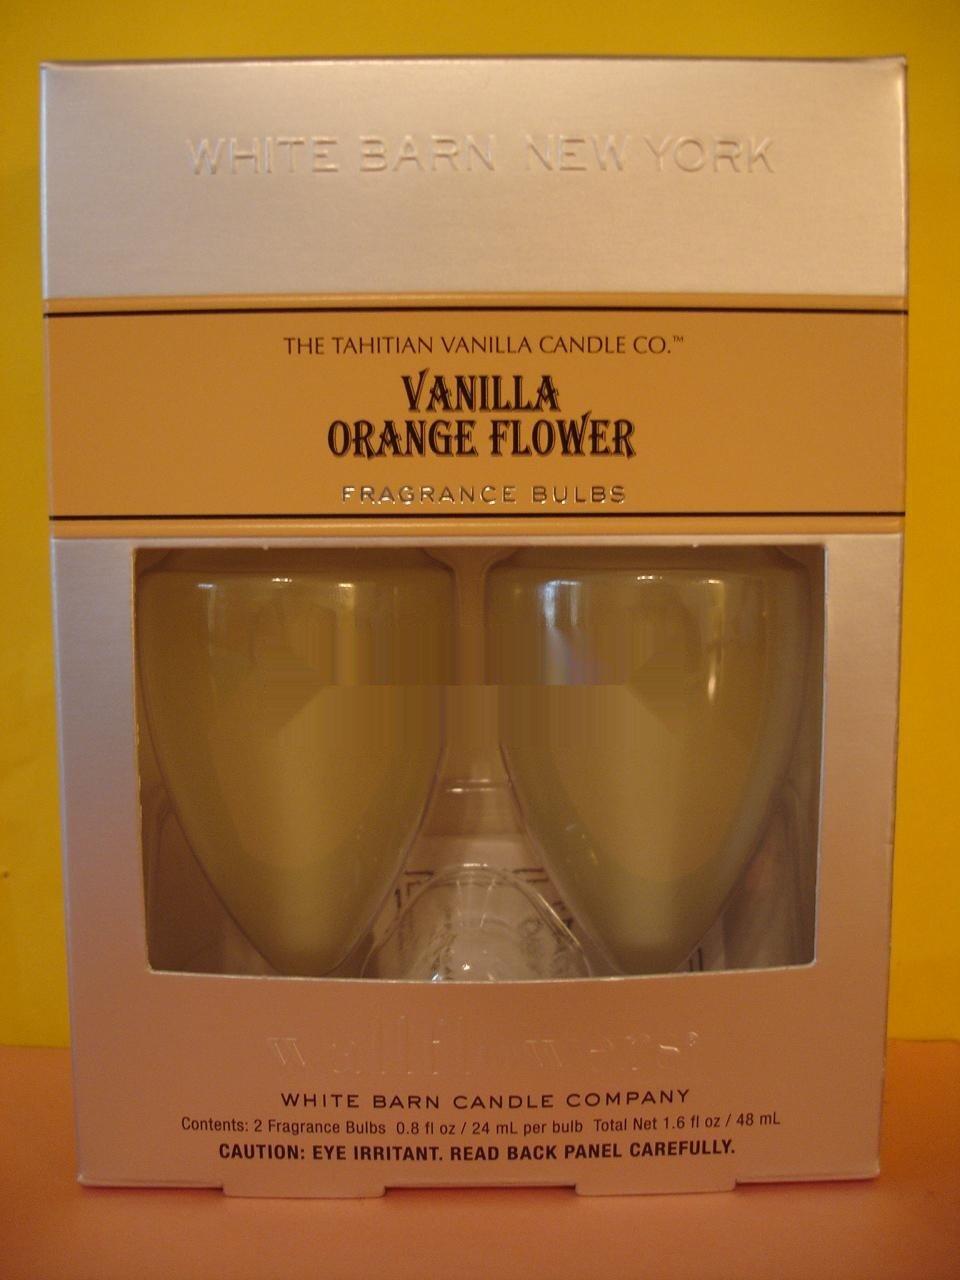 Bath & Body Works 2 Vanilla Orange Flower Wallflower Refill